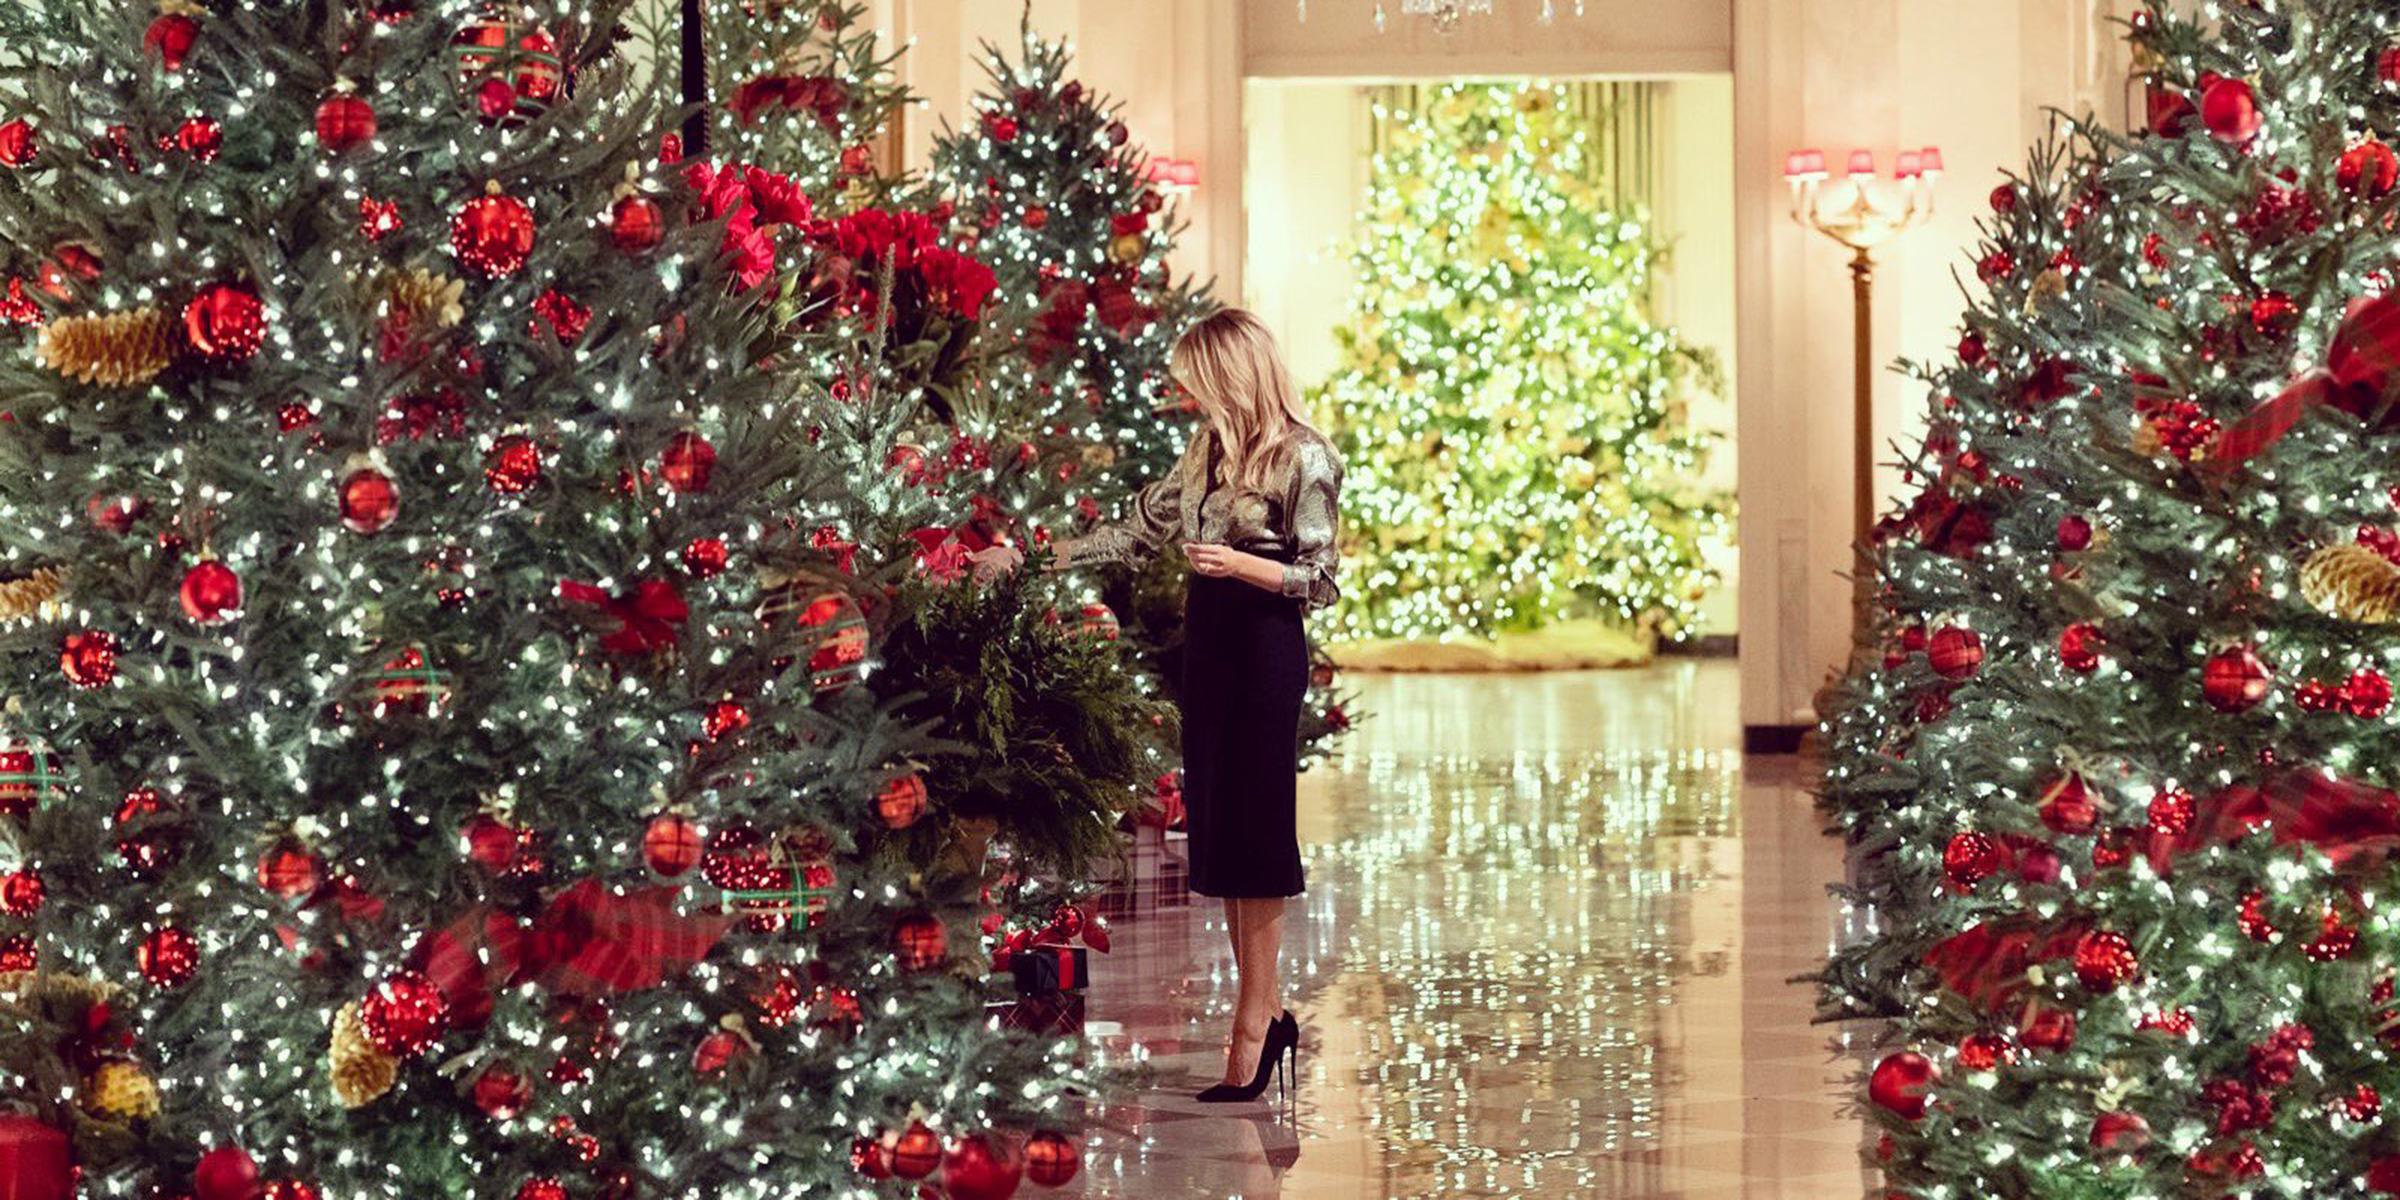 Melania Trump Unveils 2020 White House Christmas Decorations